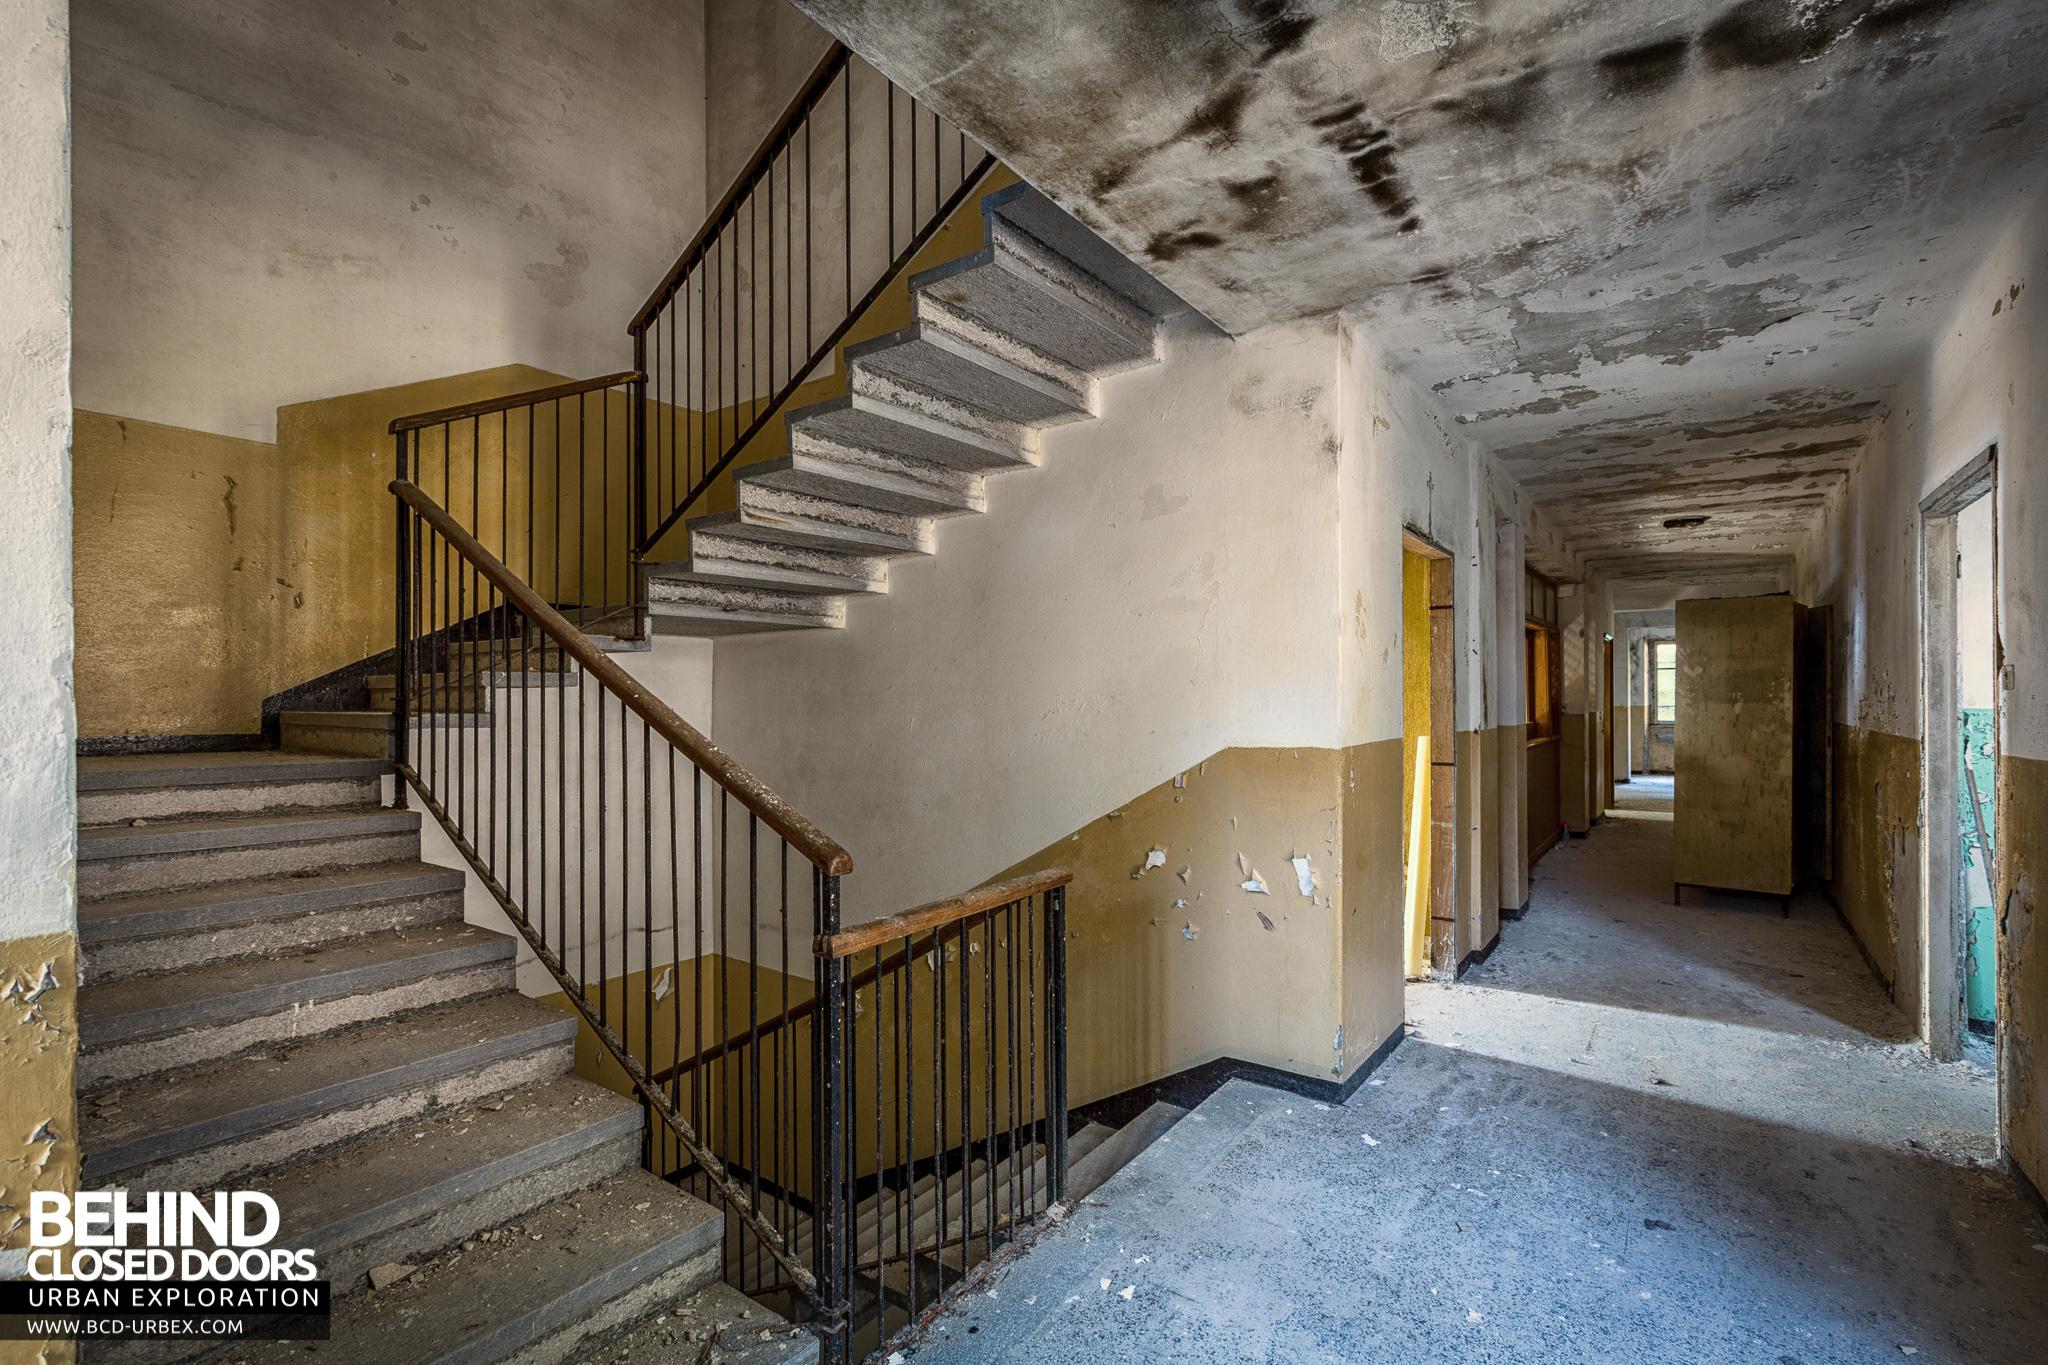 Red Cross Hospital Italy 187 Urbex Behind Closed Doors